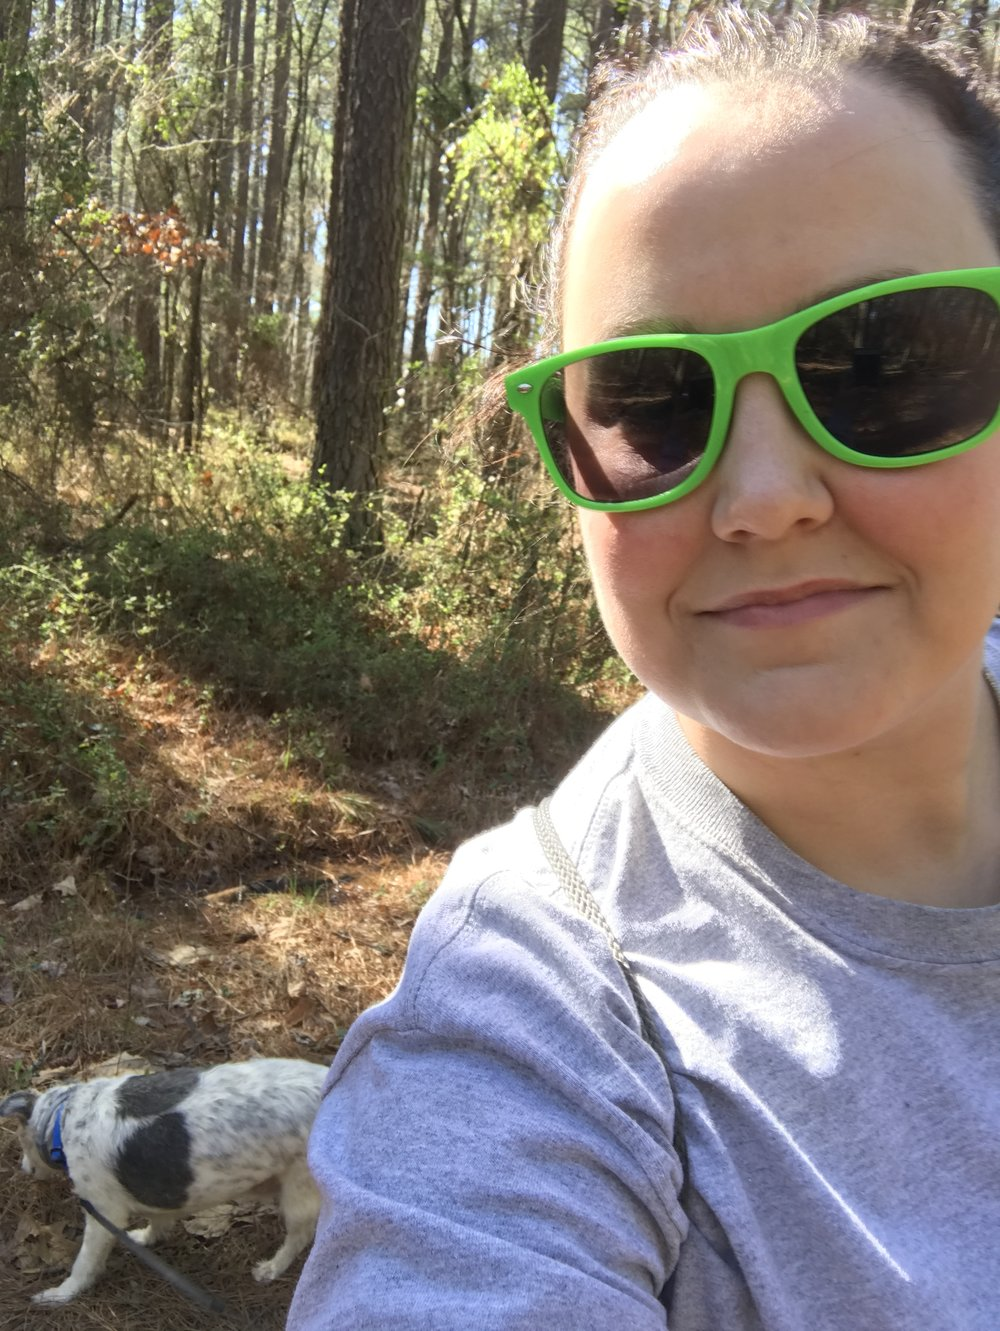 Jack and I enjoying the great outdoors